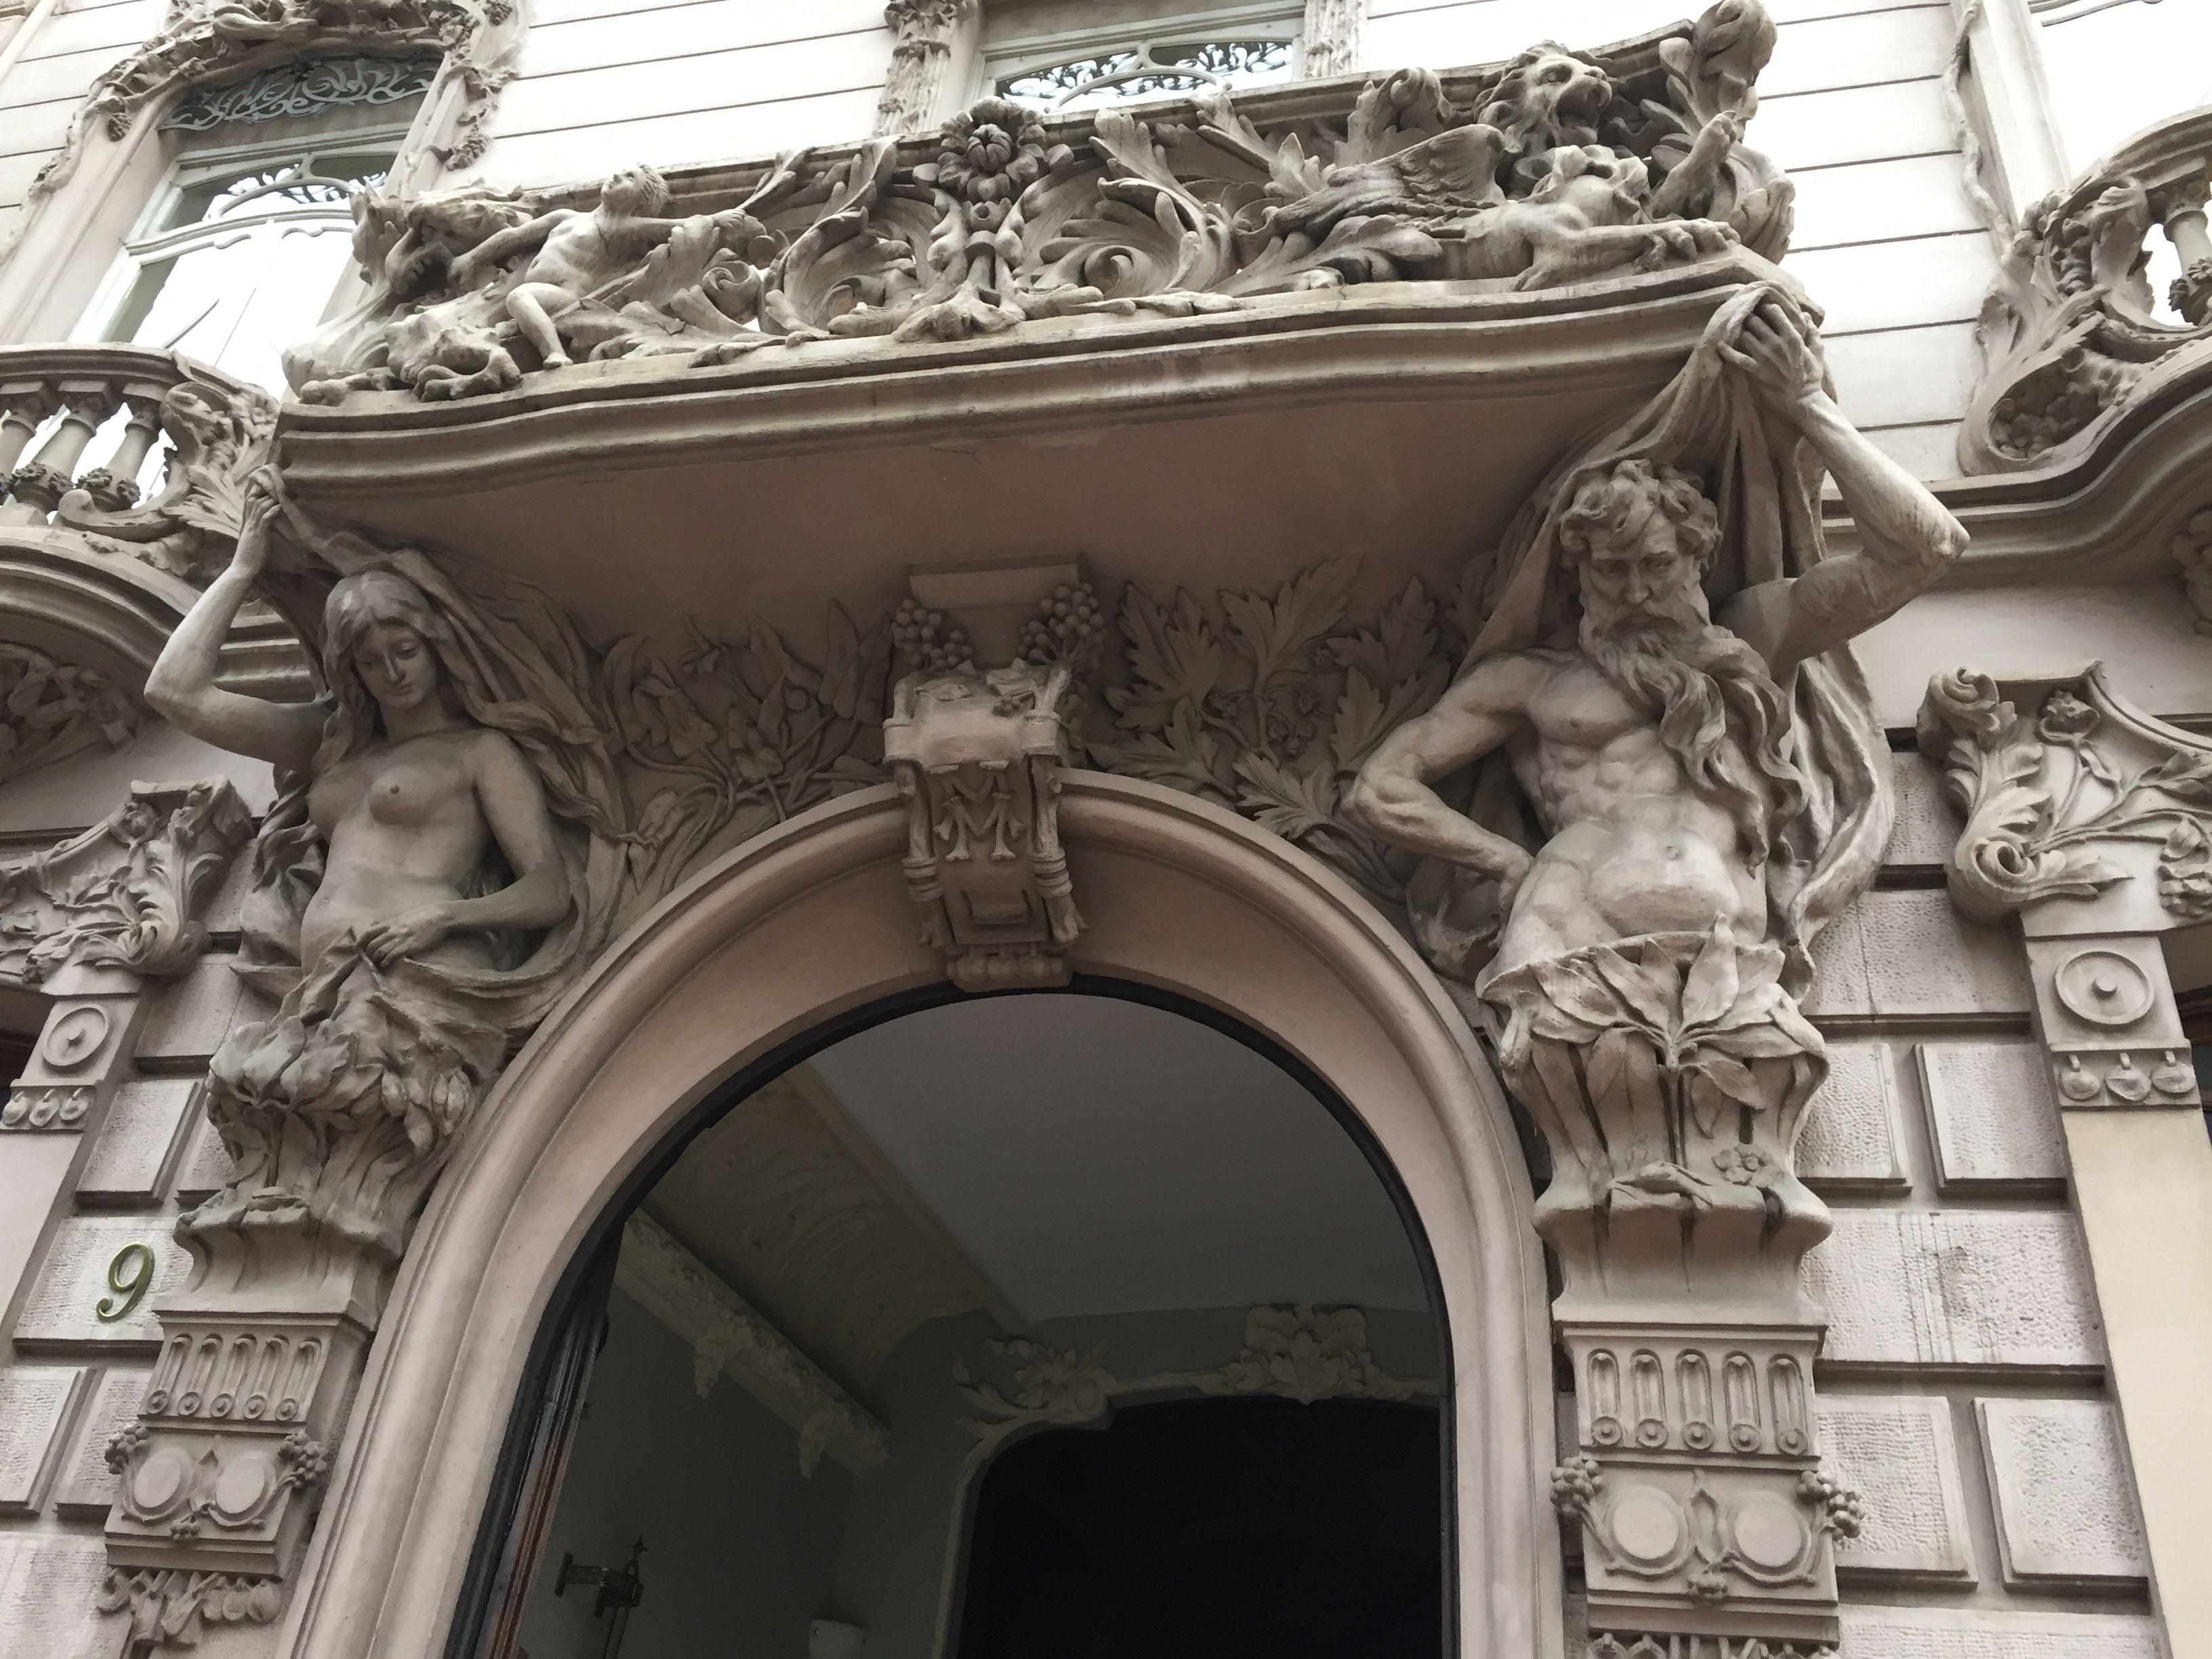 Casa Ortega Valencia Espa±a 1904 Art Nouveau Arquitecto Manuel Peris Ferrando Edificios modernistas Pinterest